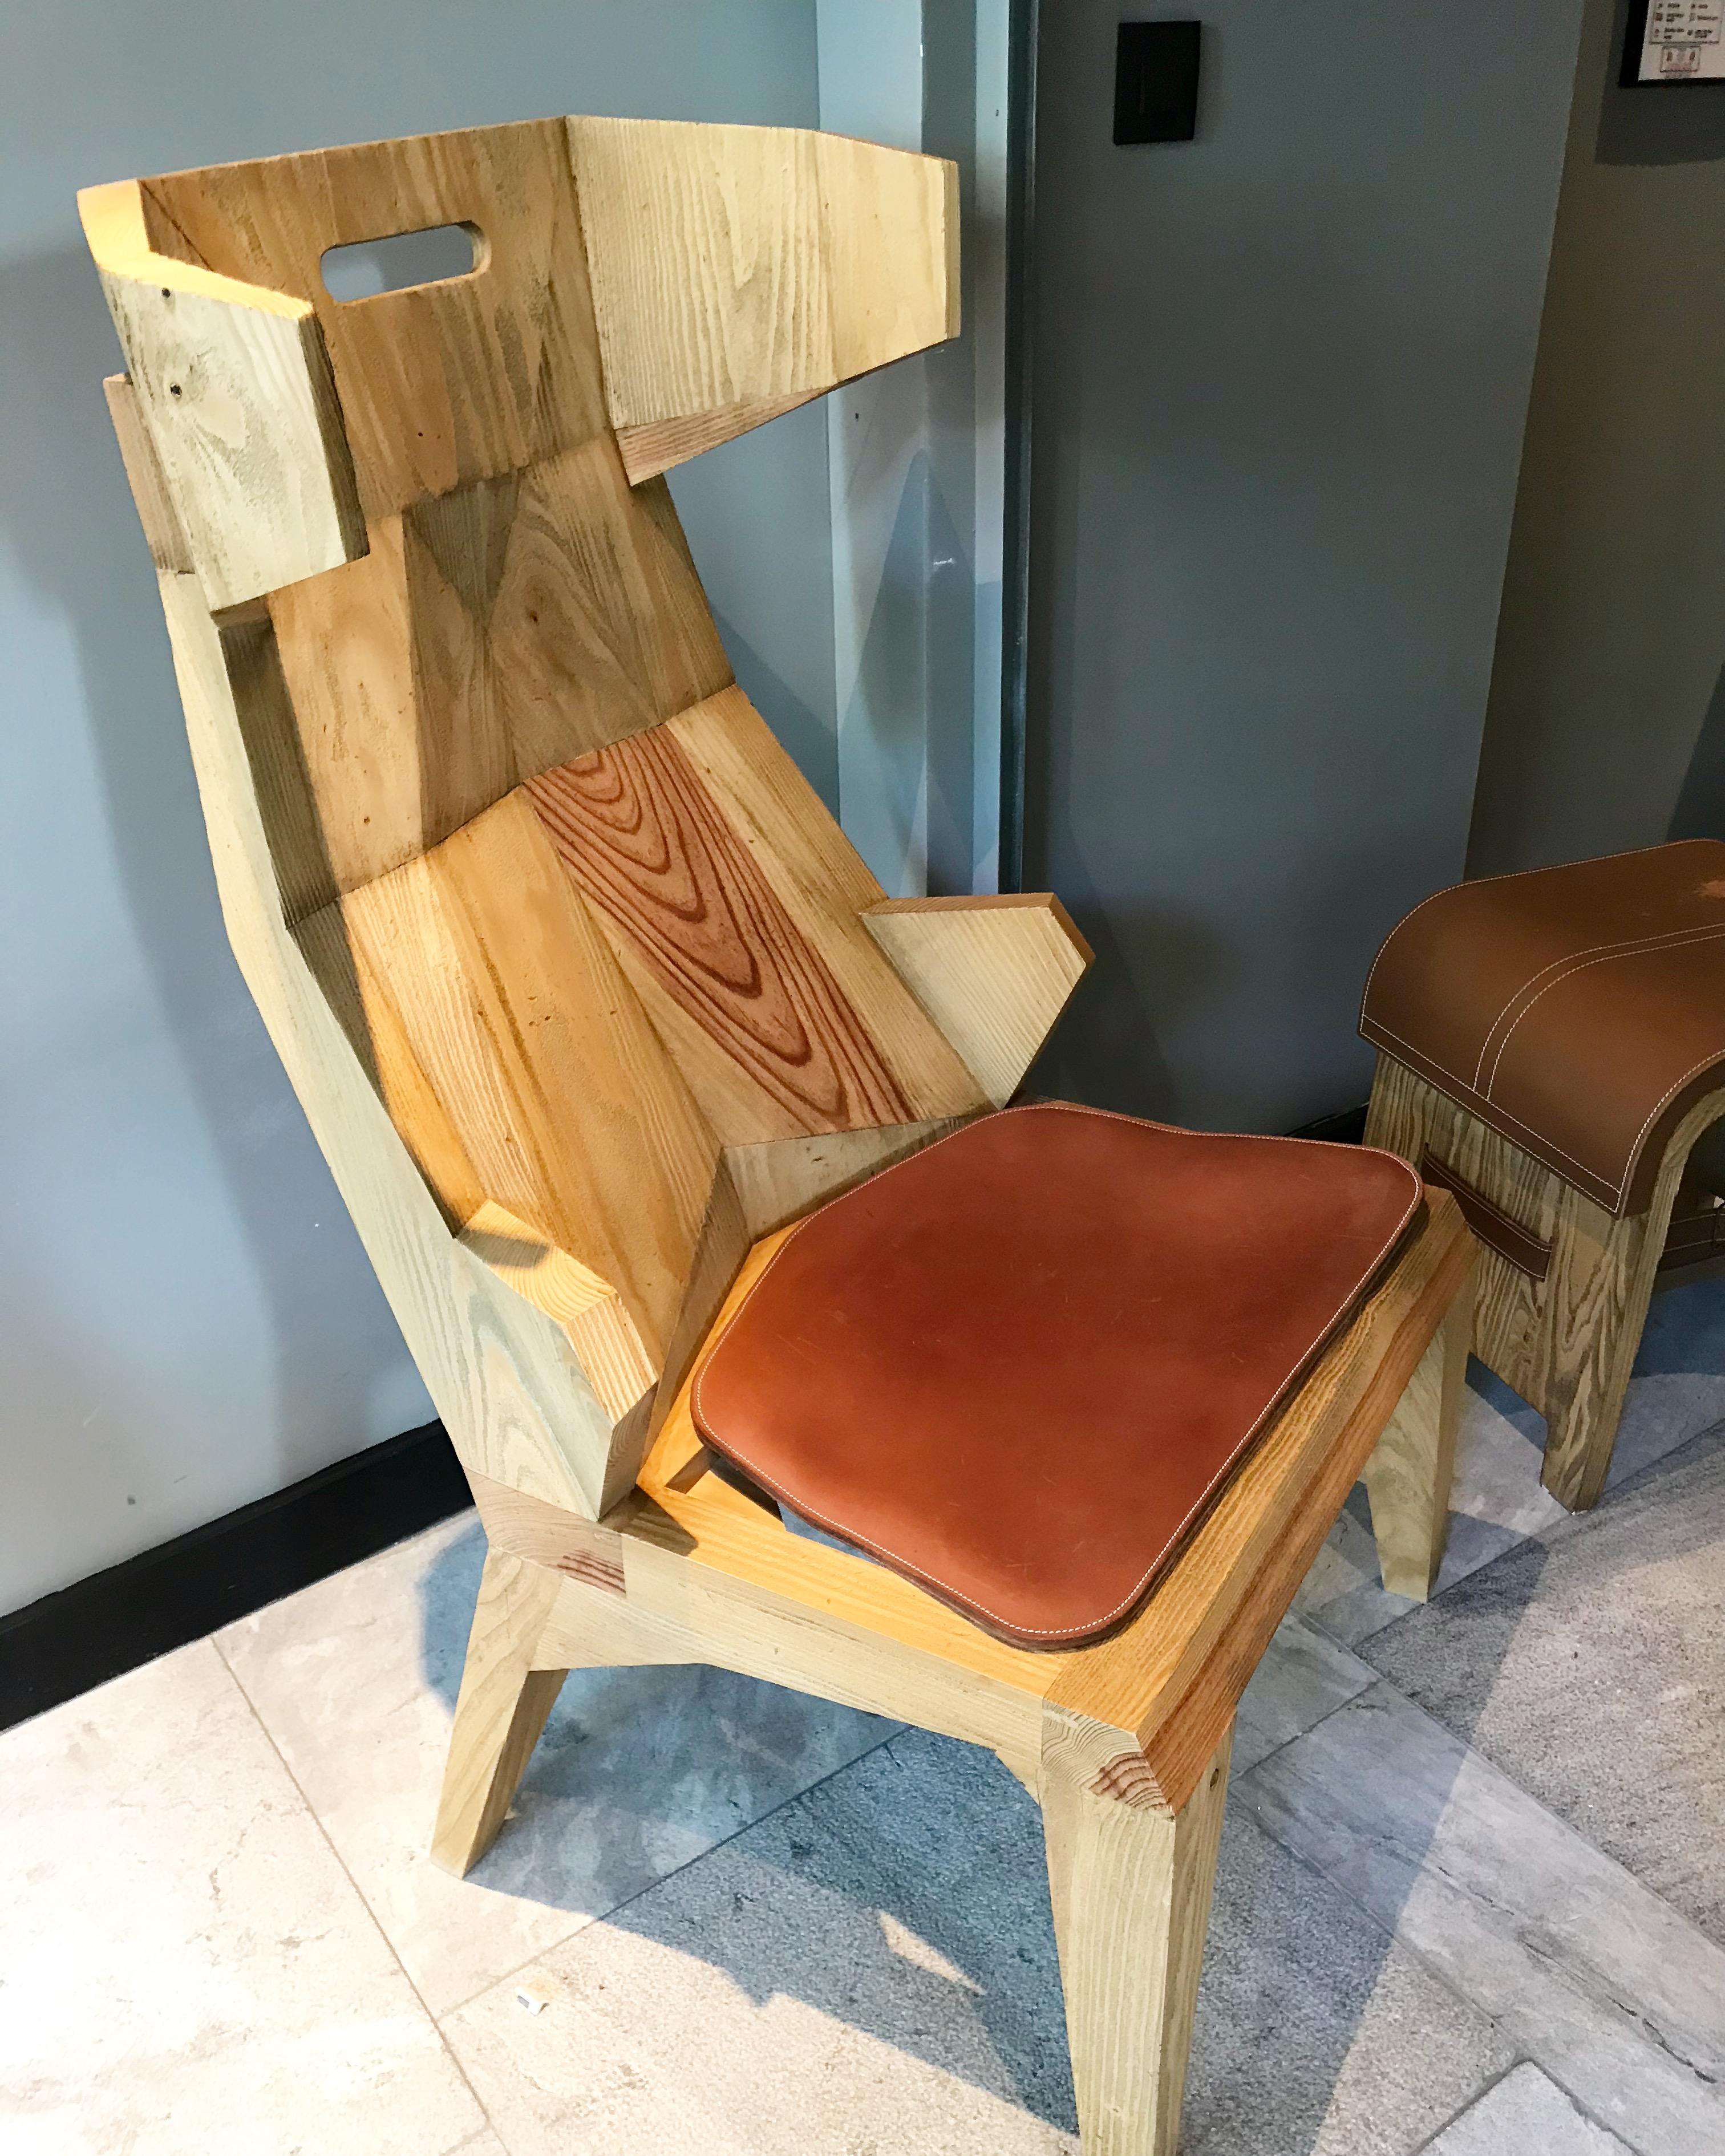 fauteuil l entr e. Black Bedroom Furniture Sets. Home Design Ideas